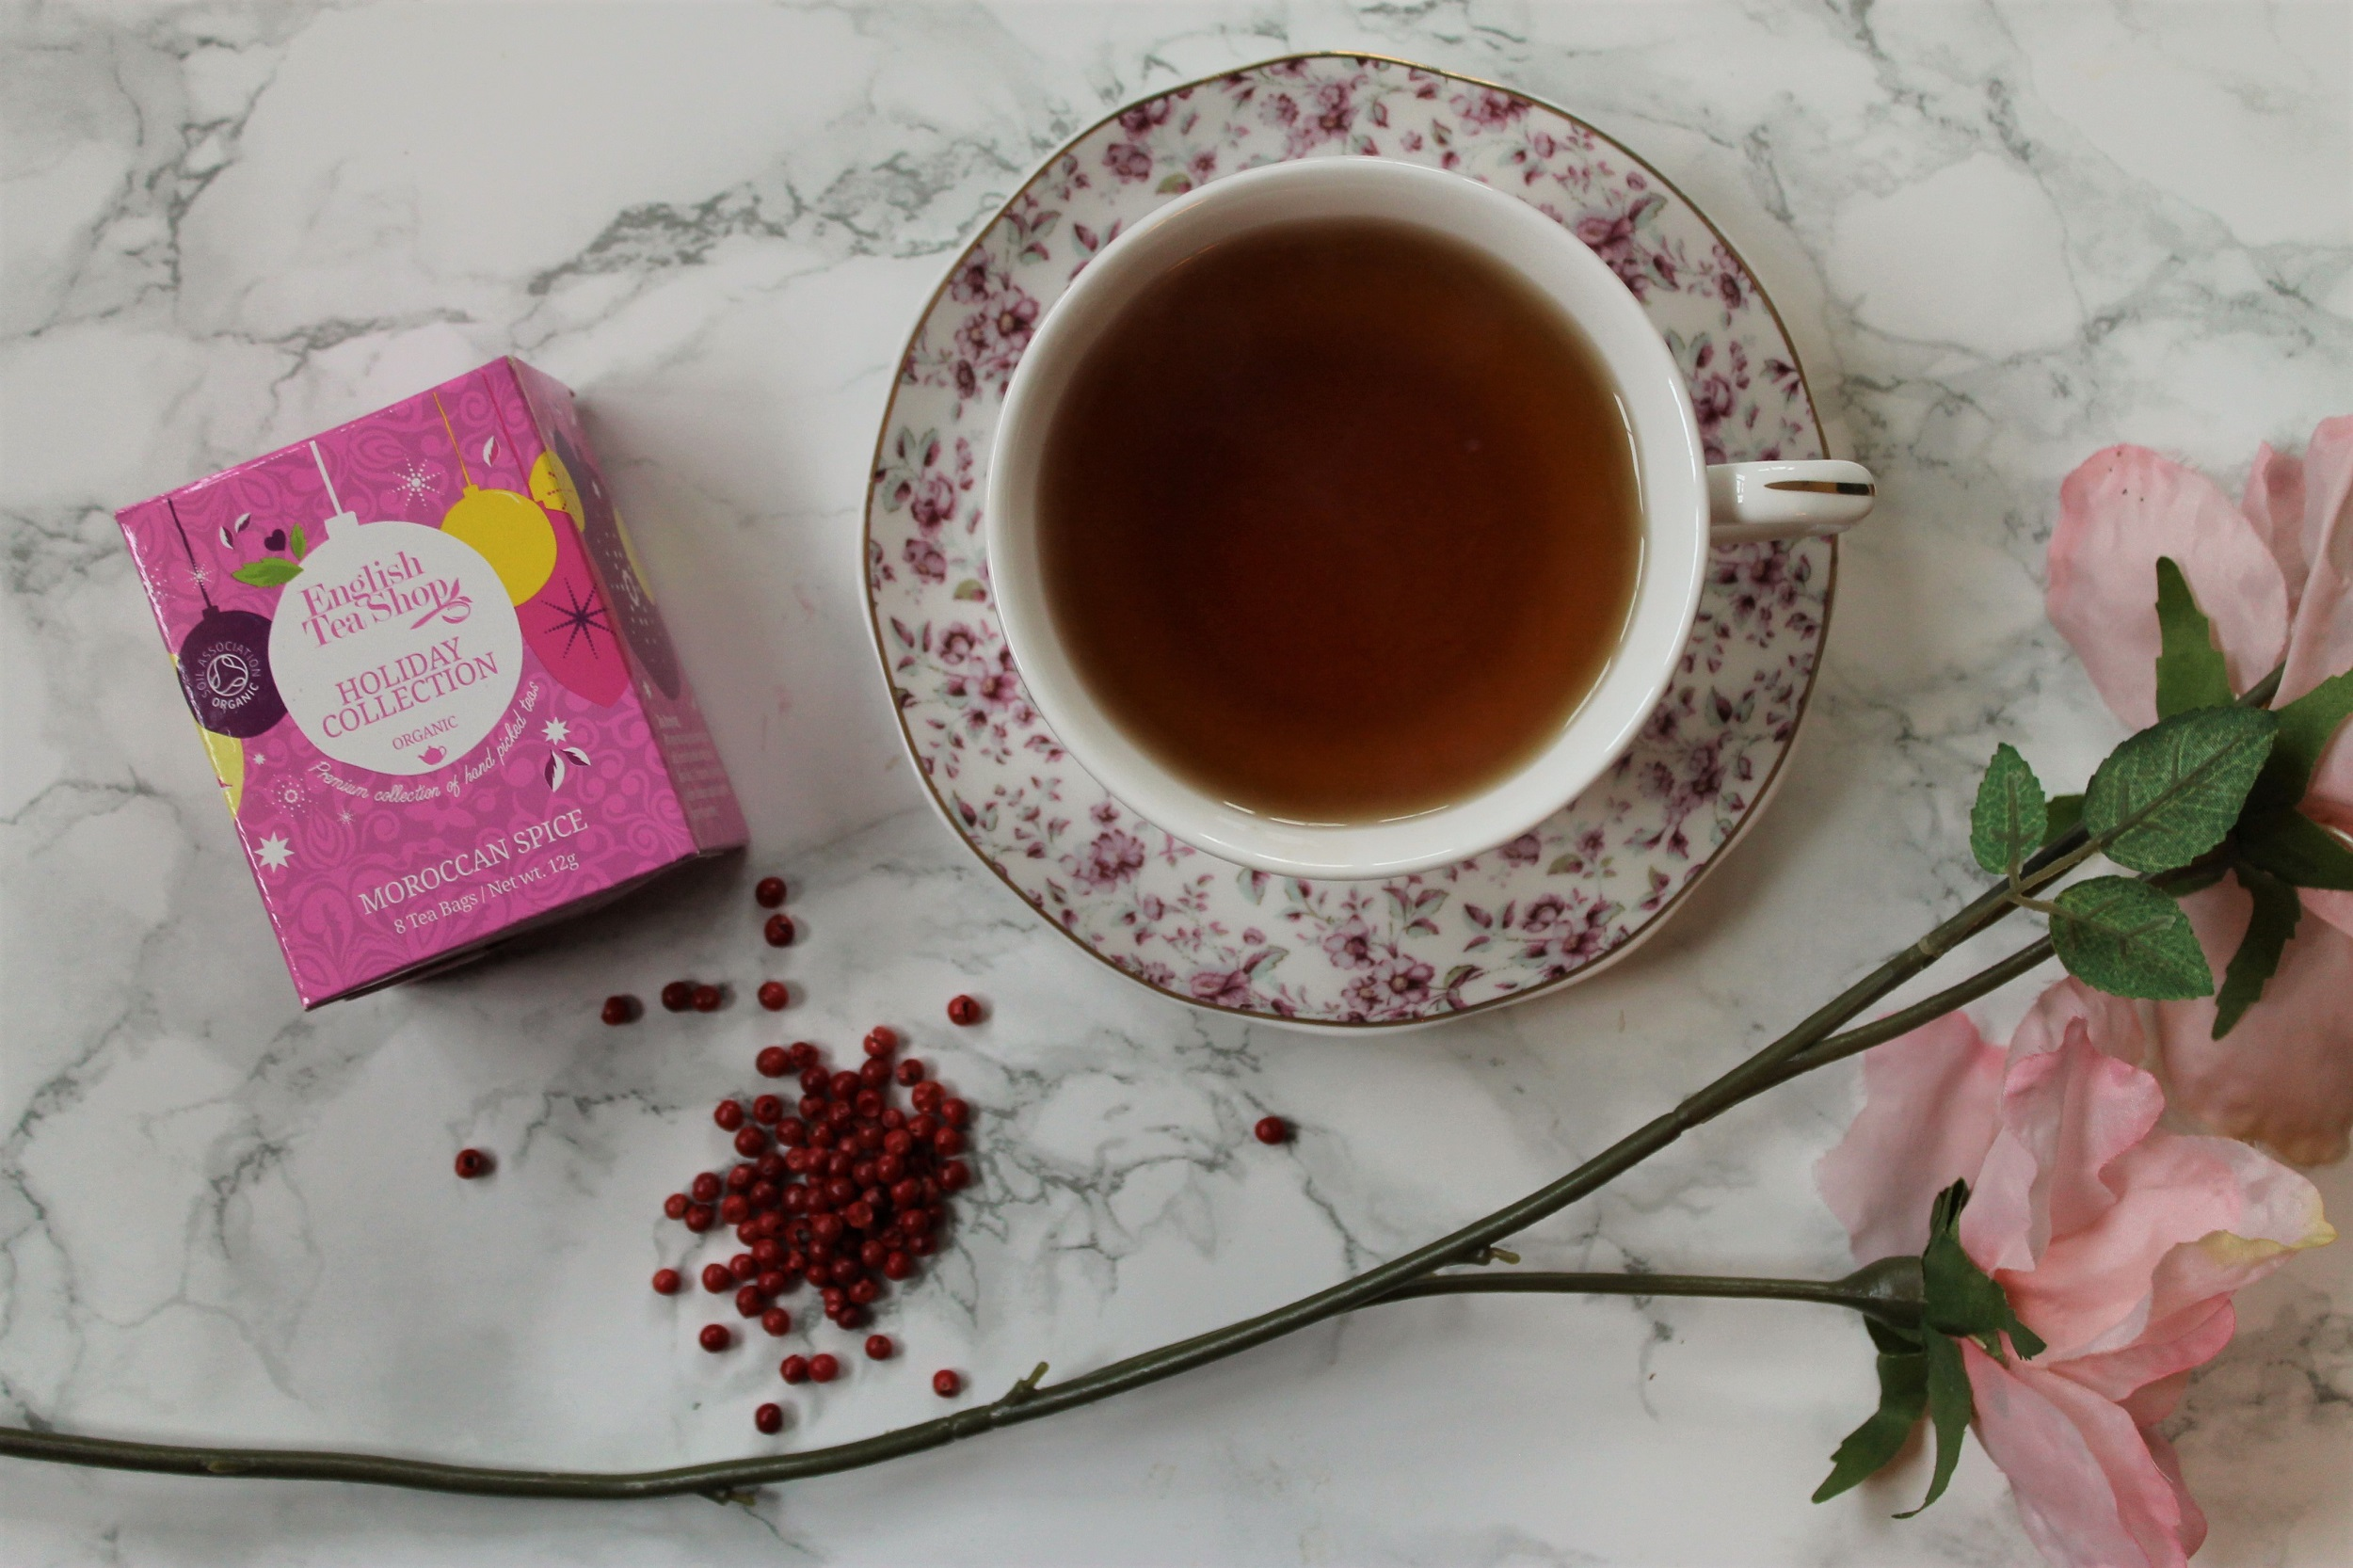 English Tea Shop Moroccan Spice Herbal Tea Review